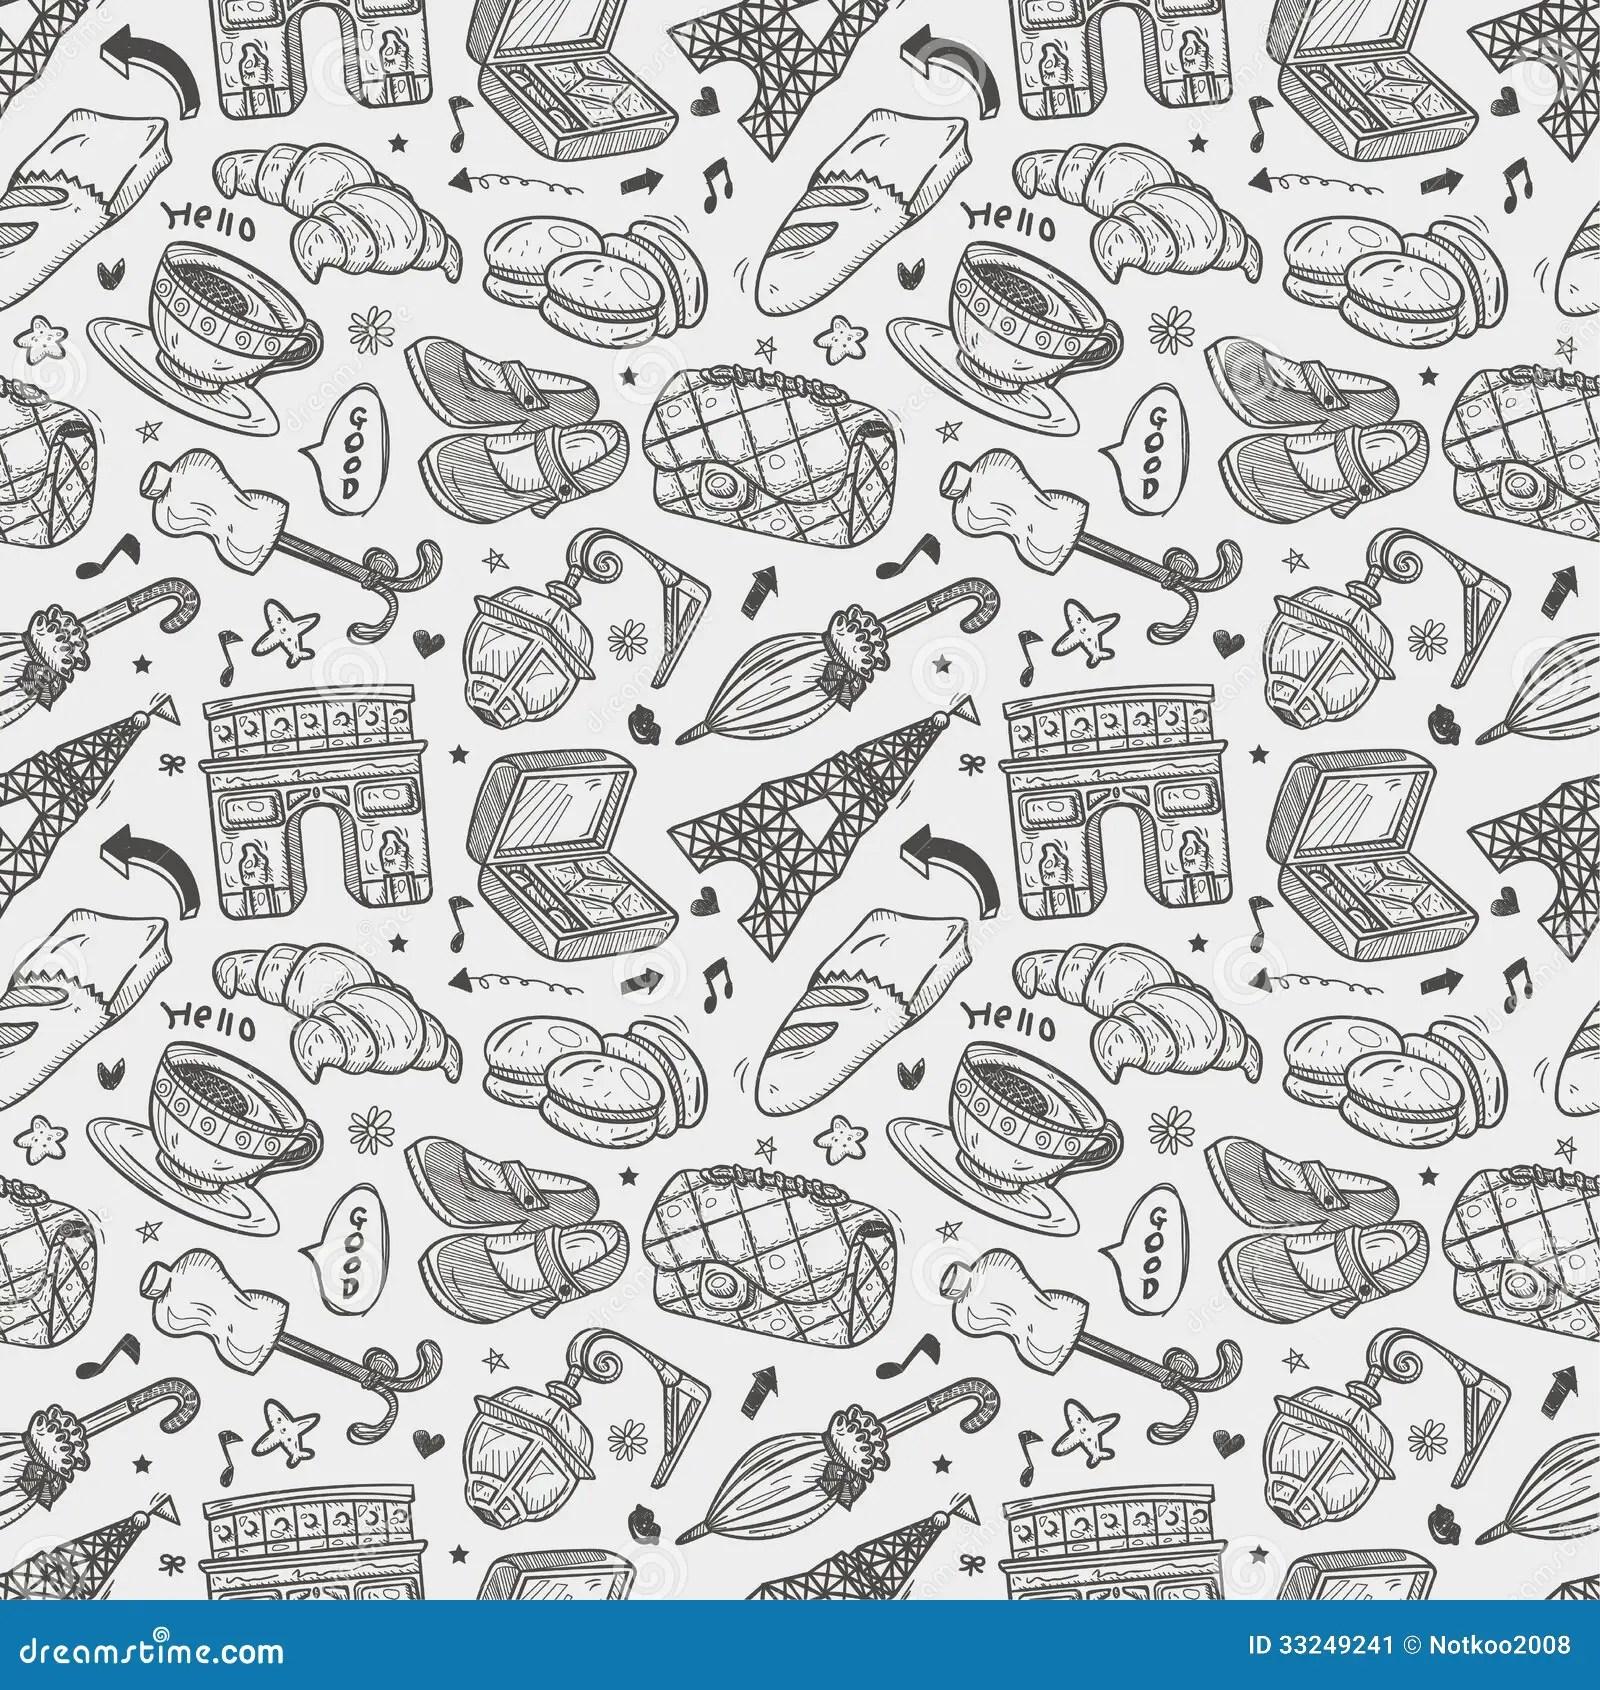 Cute Macaron Wallpaper Seamless Doodle Paris Pattern Stock Illustration